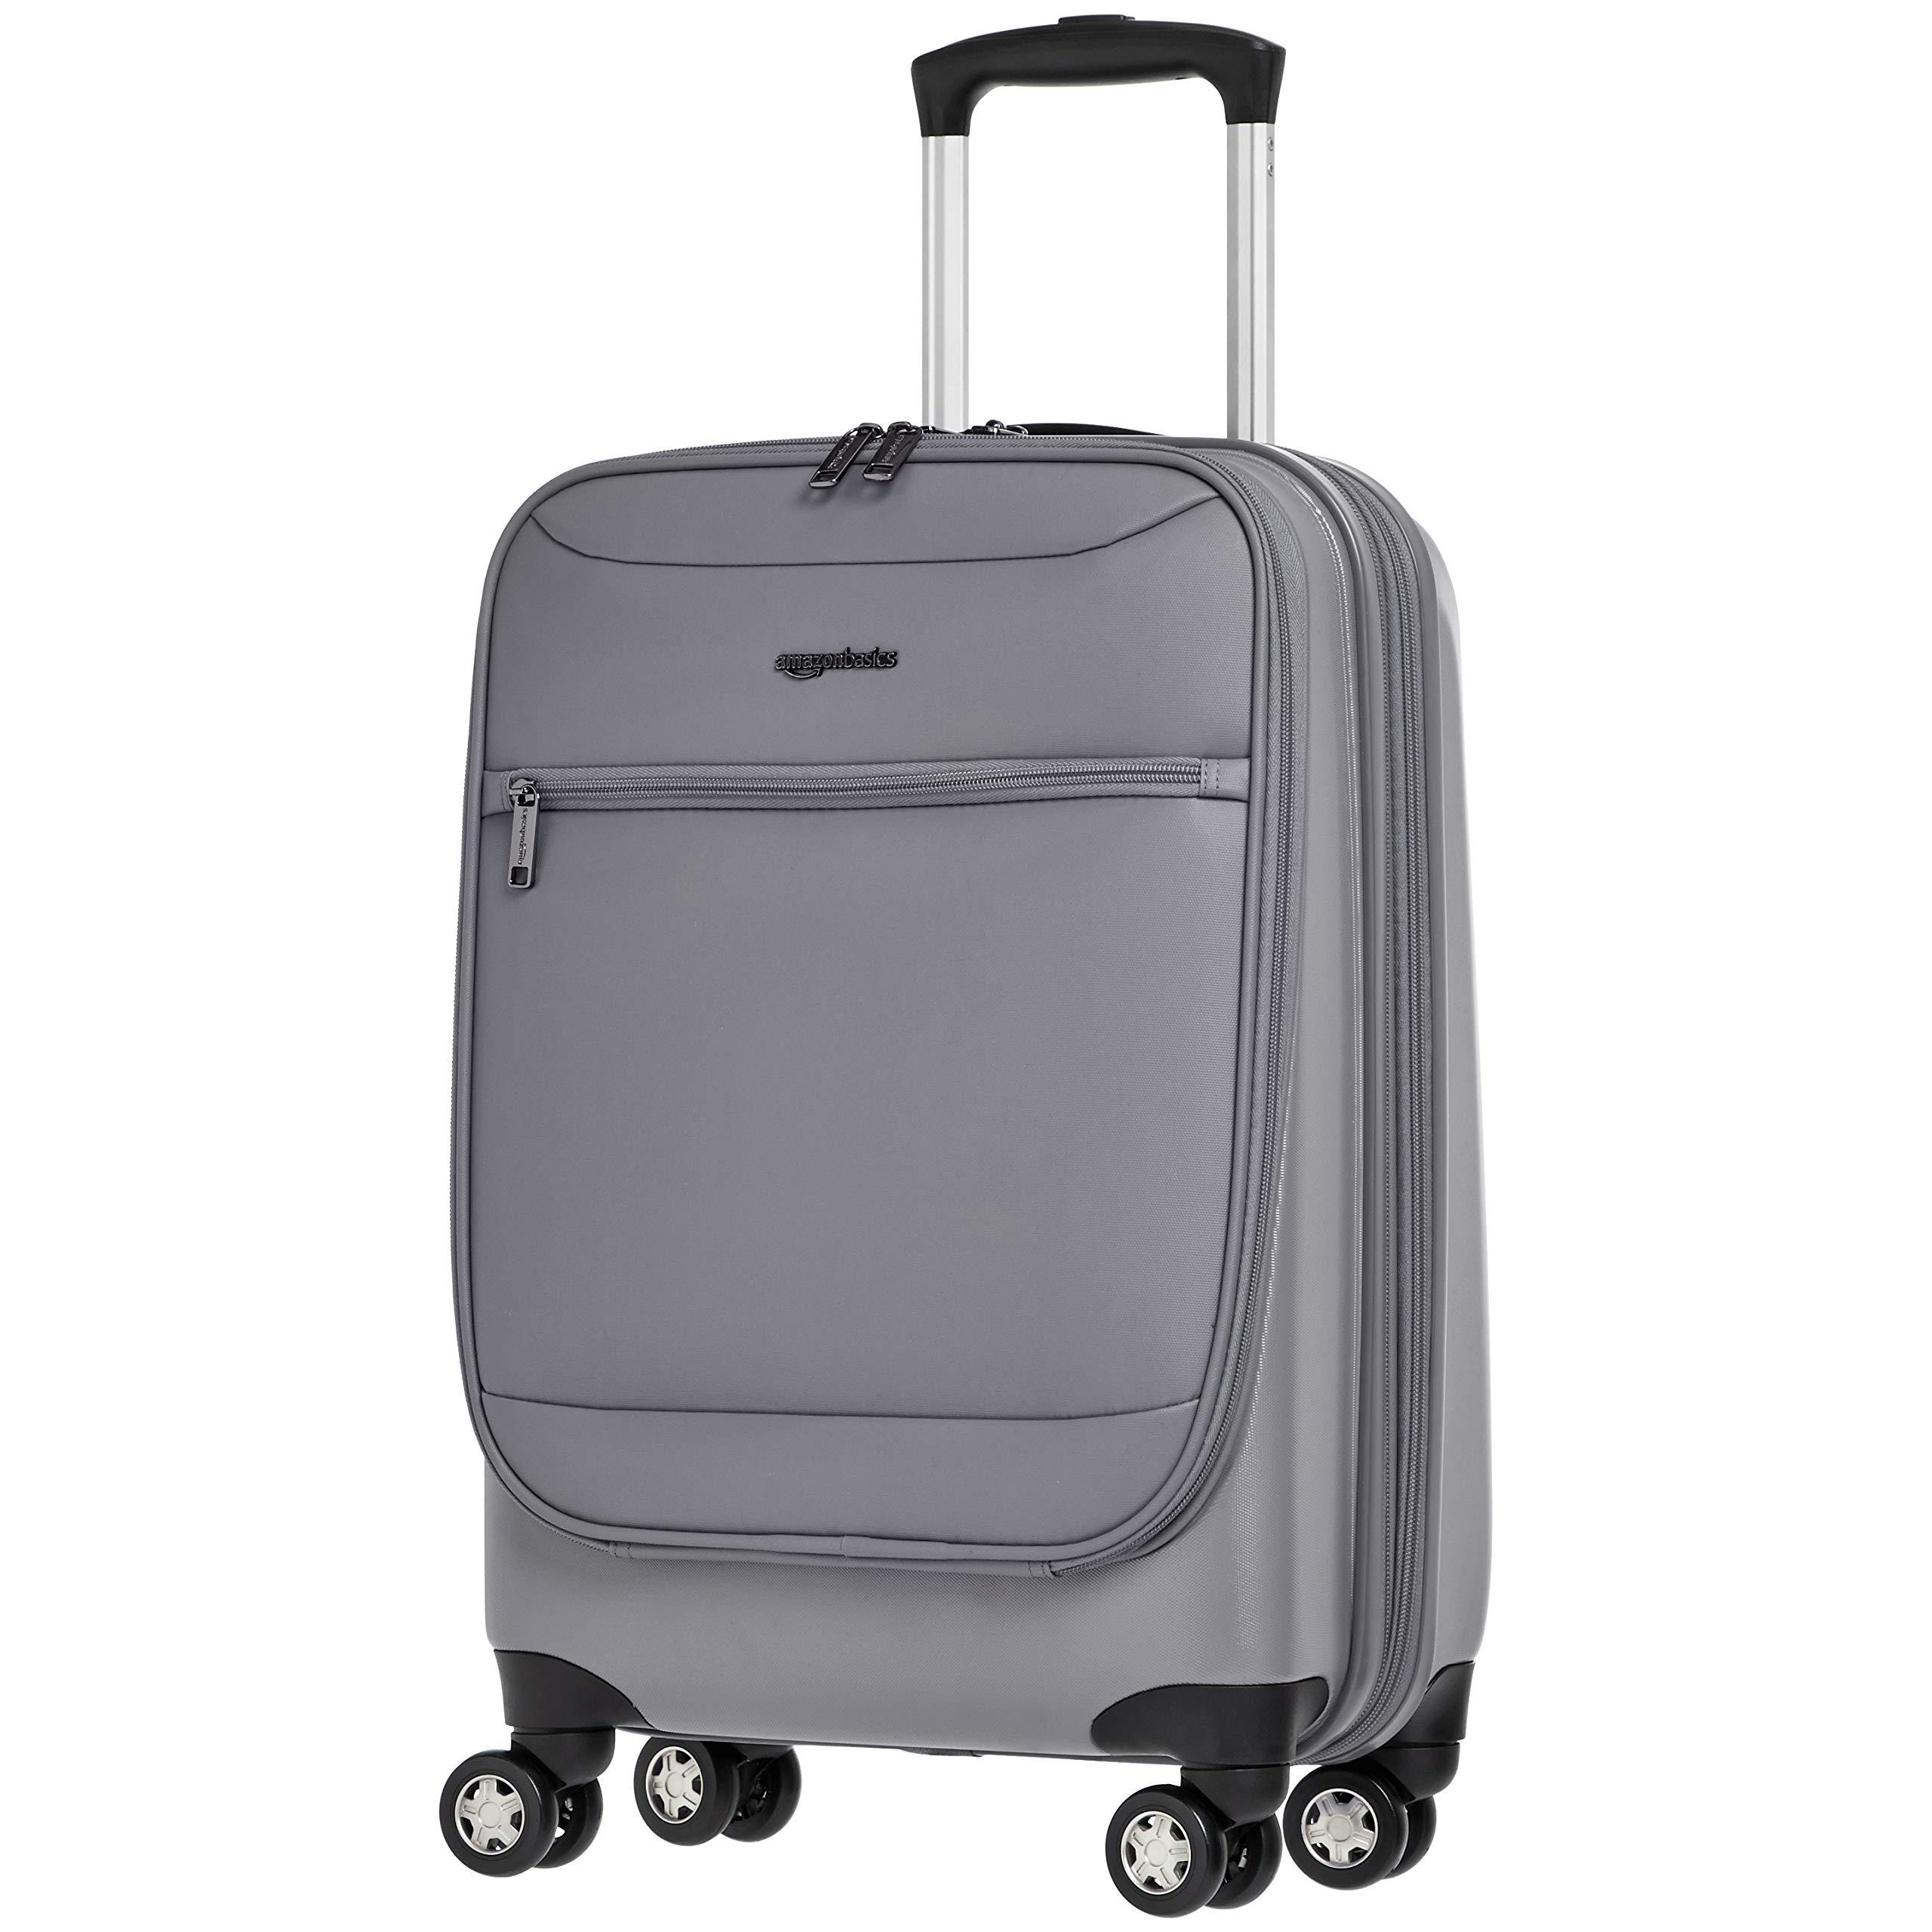 AmazonBasics Hybrid Exterior Carry-On Expandable Spinner Luggage Suitcase - 20 Inch, Grey